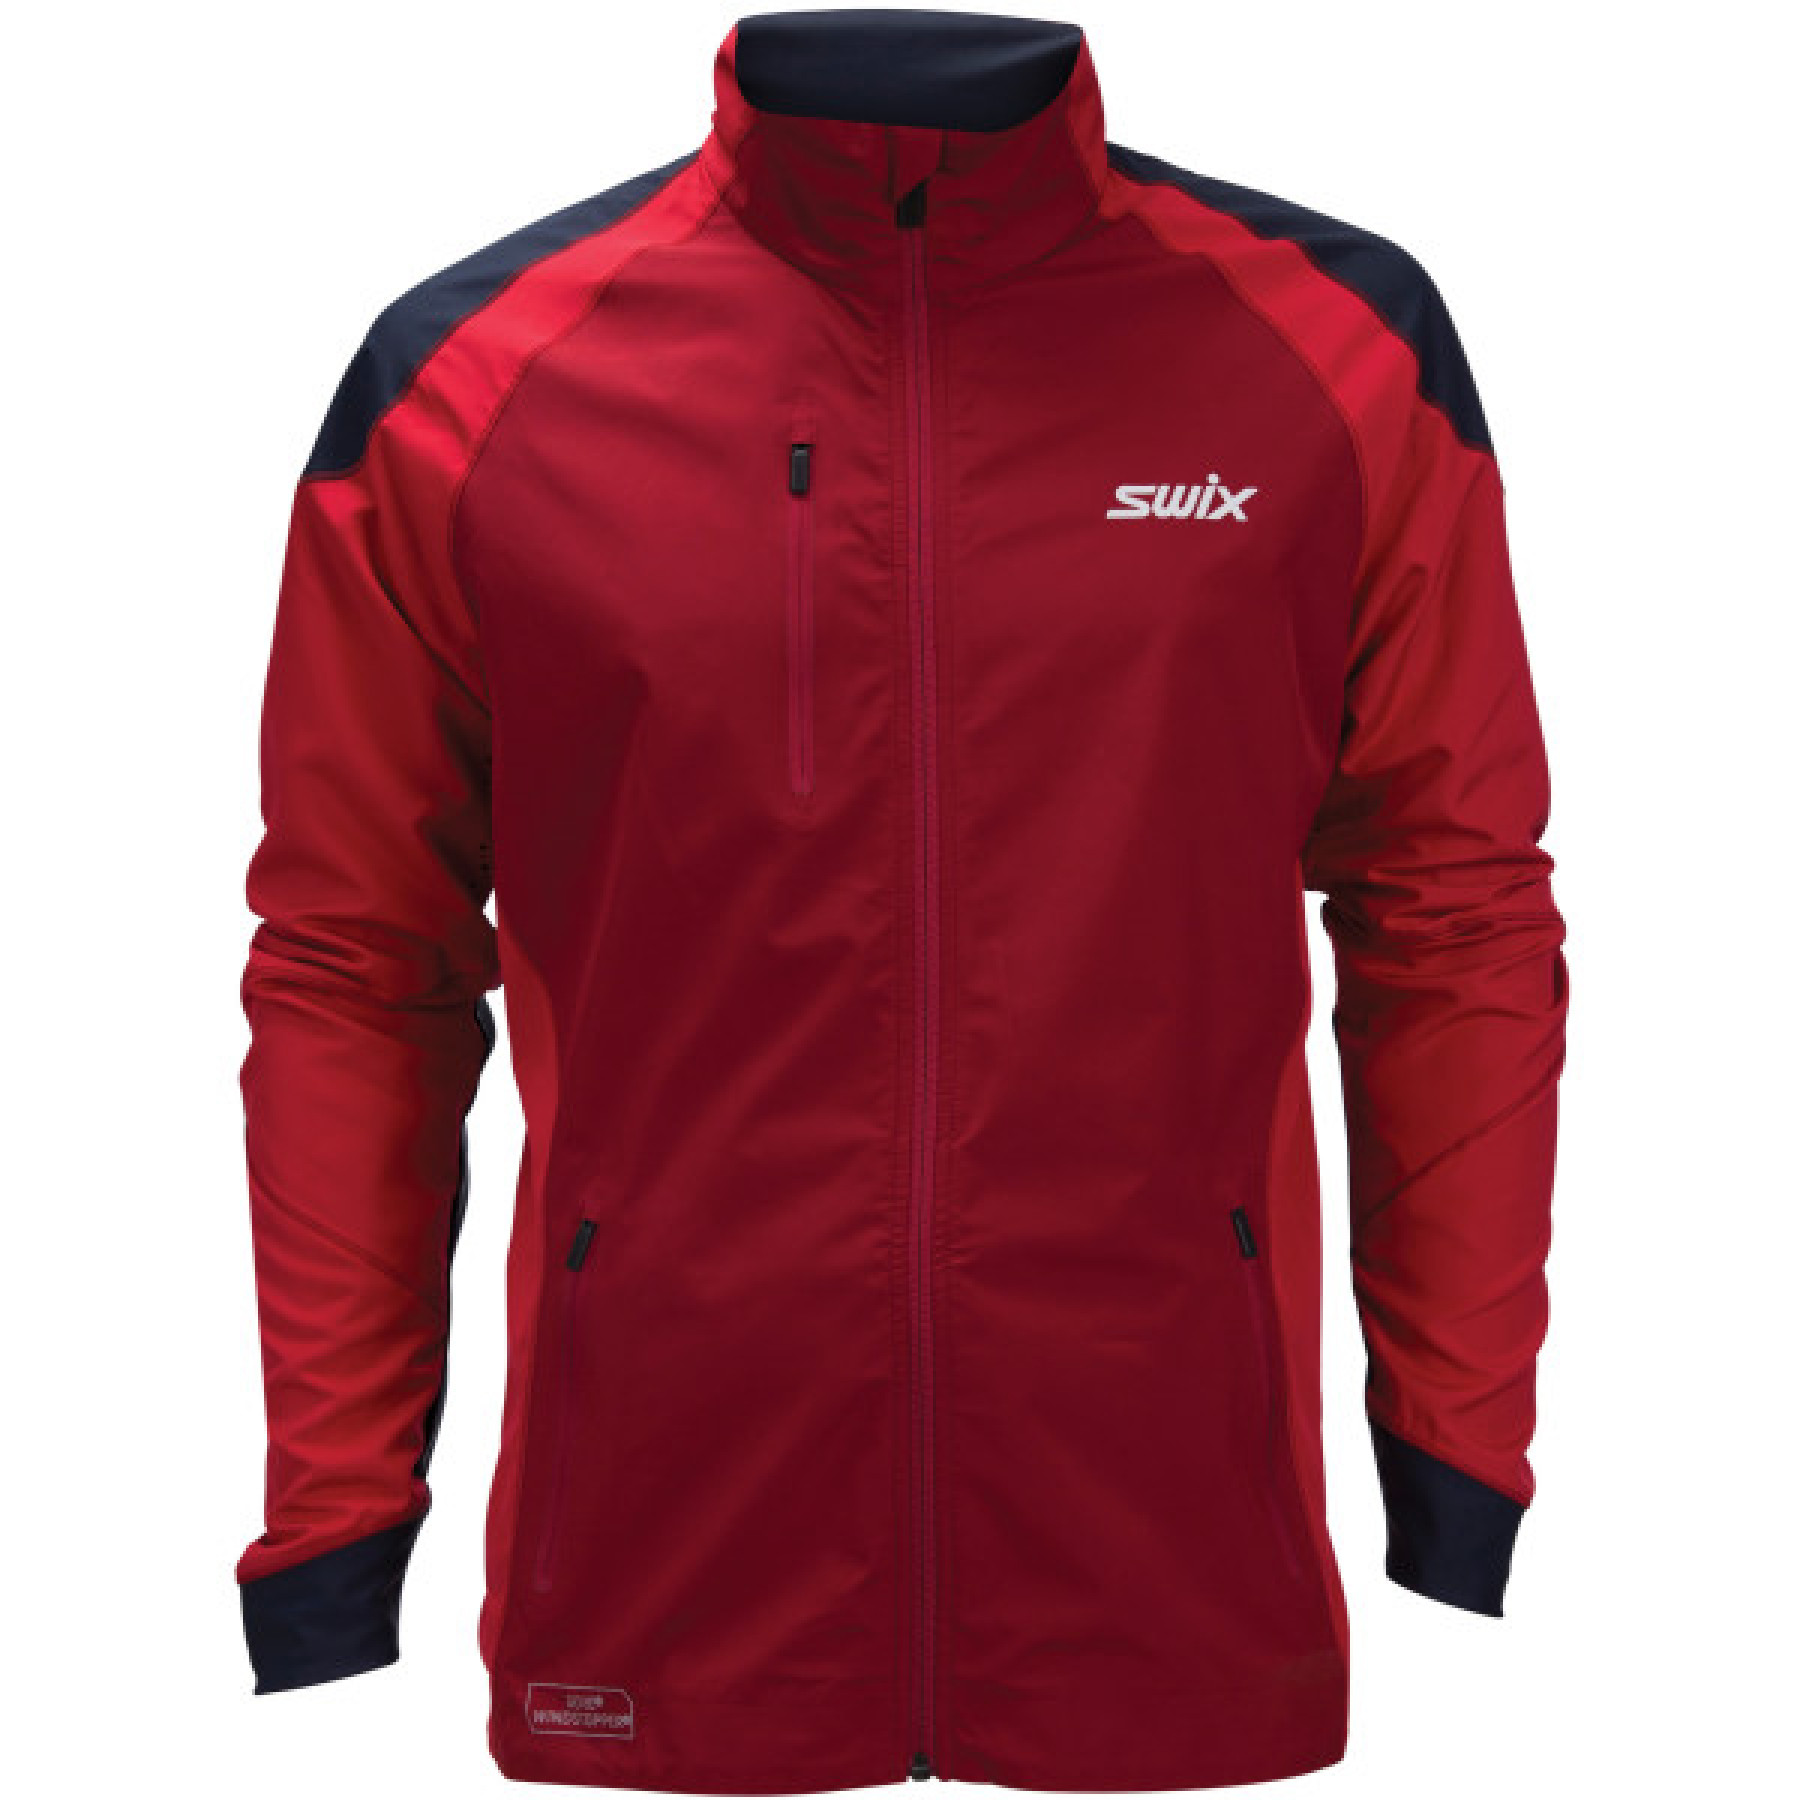 Swix Profit Revolution Jacket Women's Swix Red